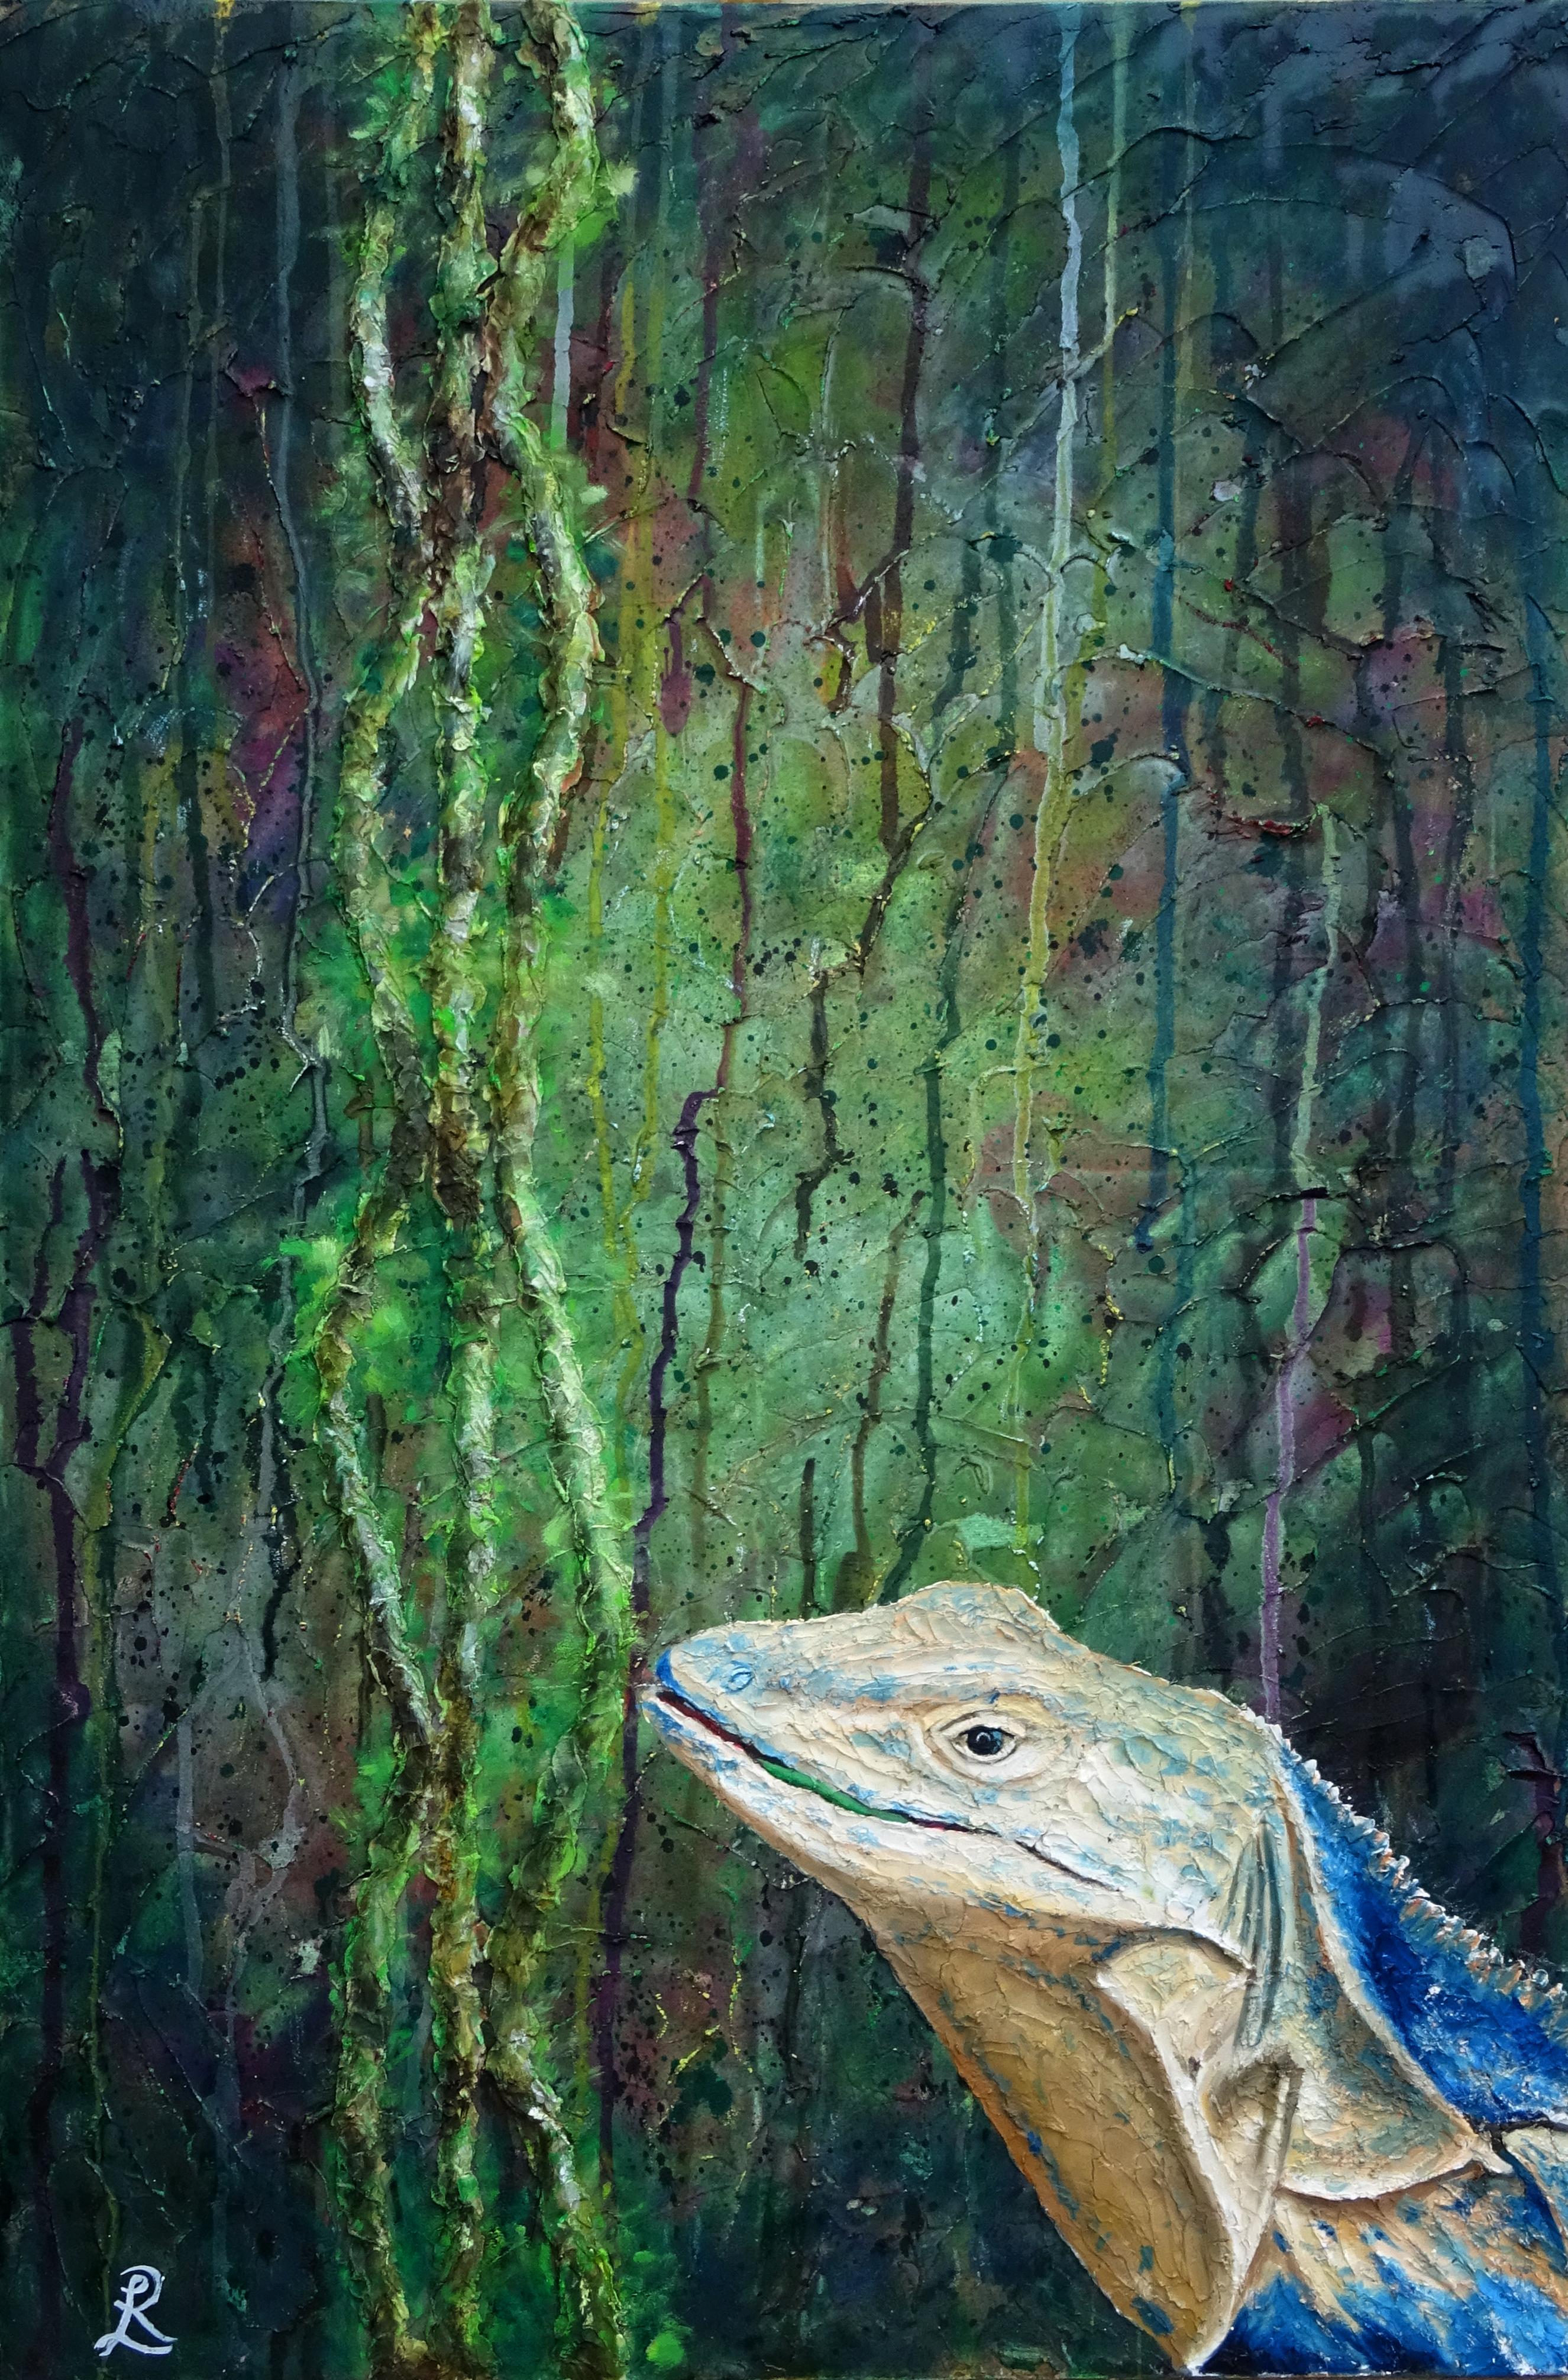 Costa Rica Iguana and lianas